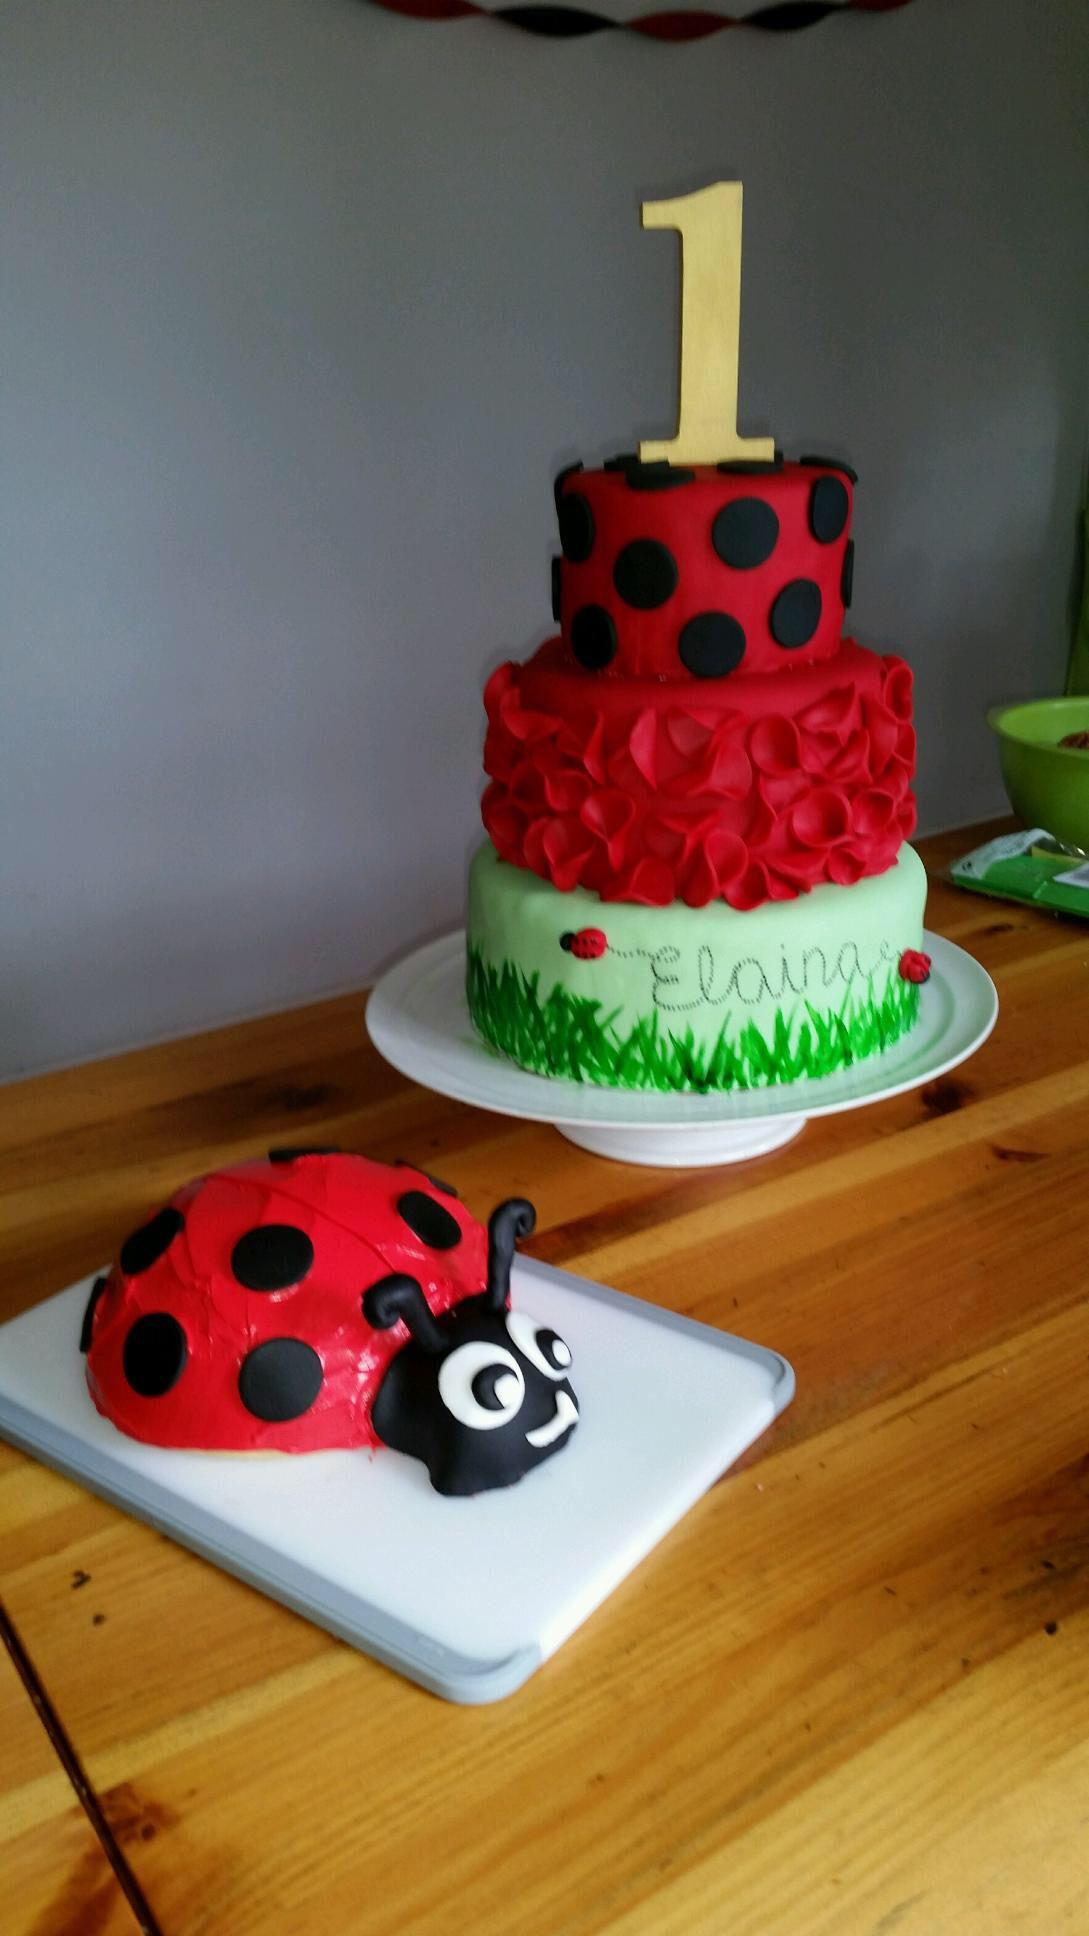 Admirable Ladybug Theme Elainas First Birthday With Images Ladybug Funny Birthday Cards Online Kookostrdamsfinfo